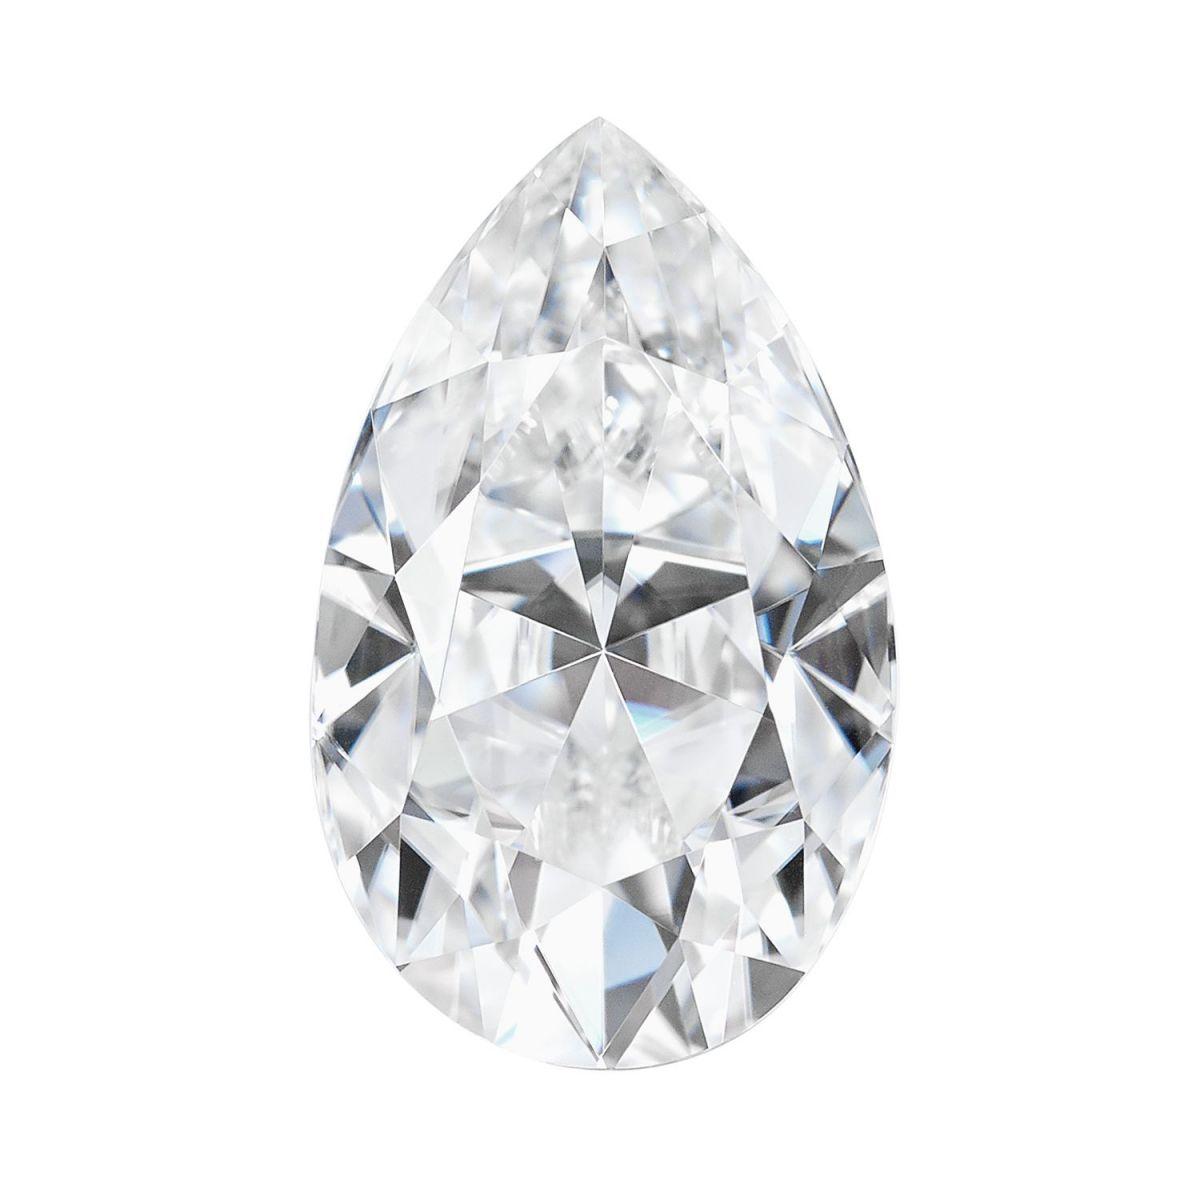 https://www.loveandpromisejewelers.com/media/catalog/product/cache/feefdef027ccf0d59dd1fef51db0610e/p/e/pear_moissanite_image_1.jpg